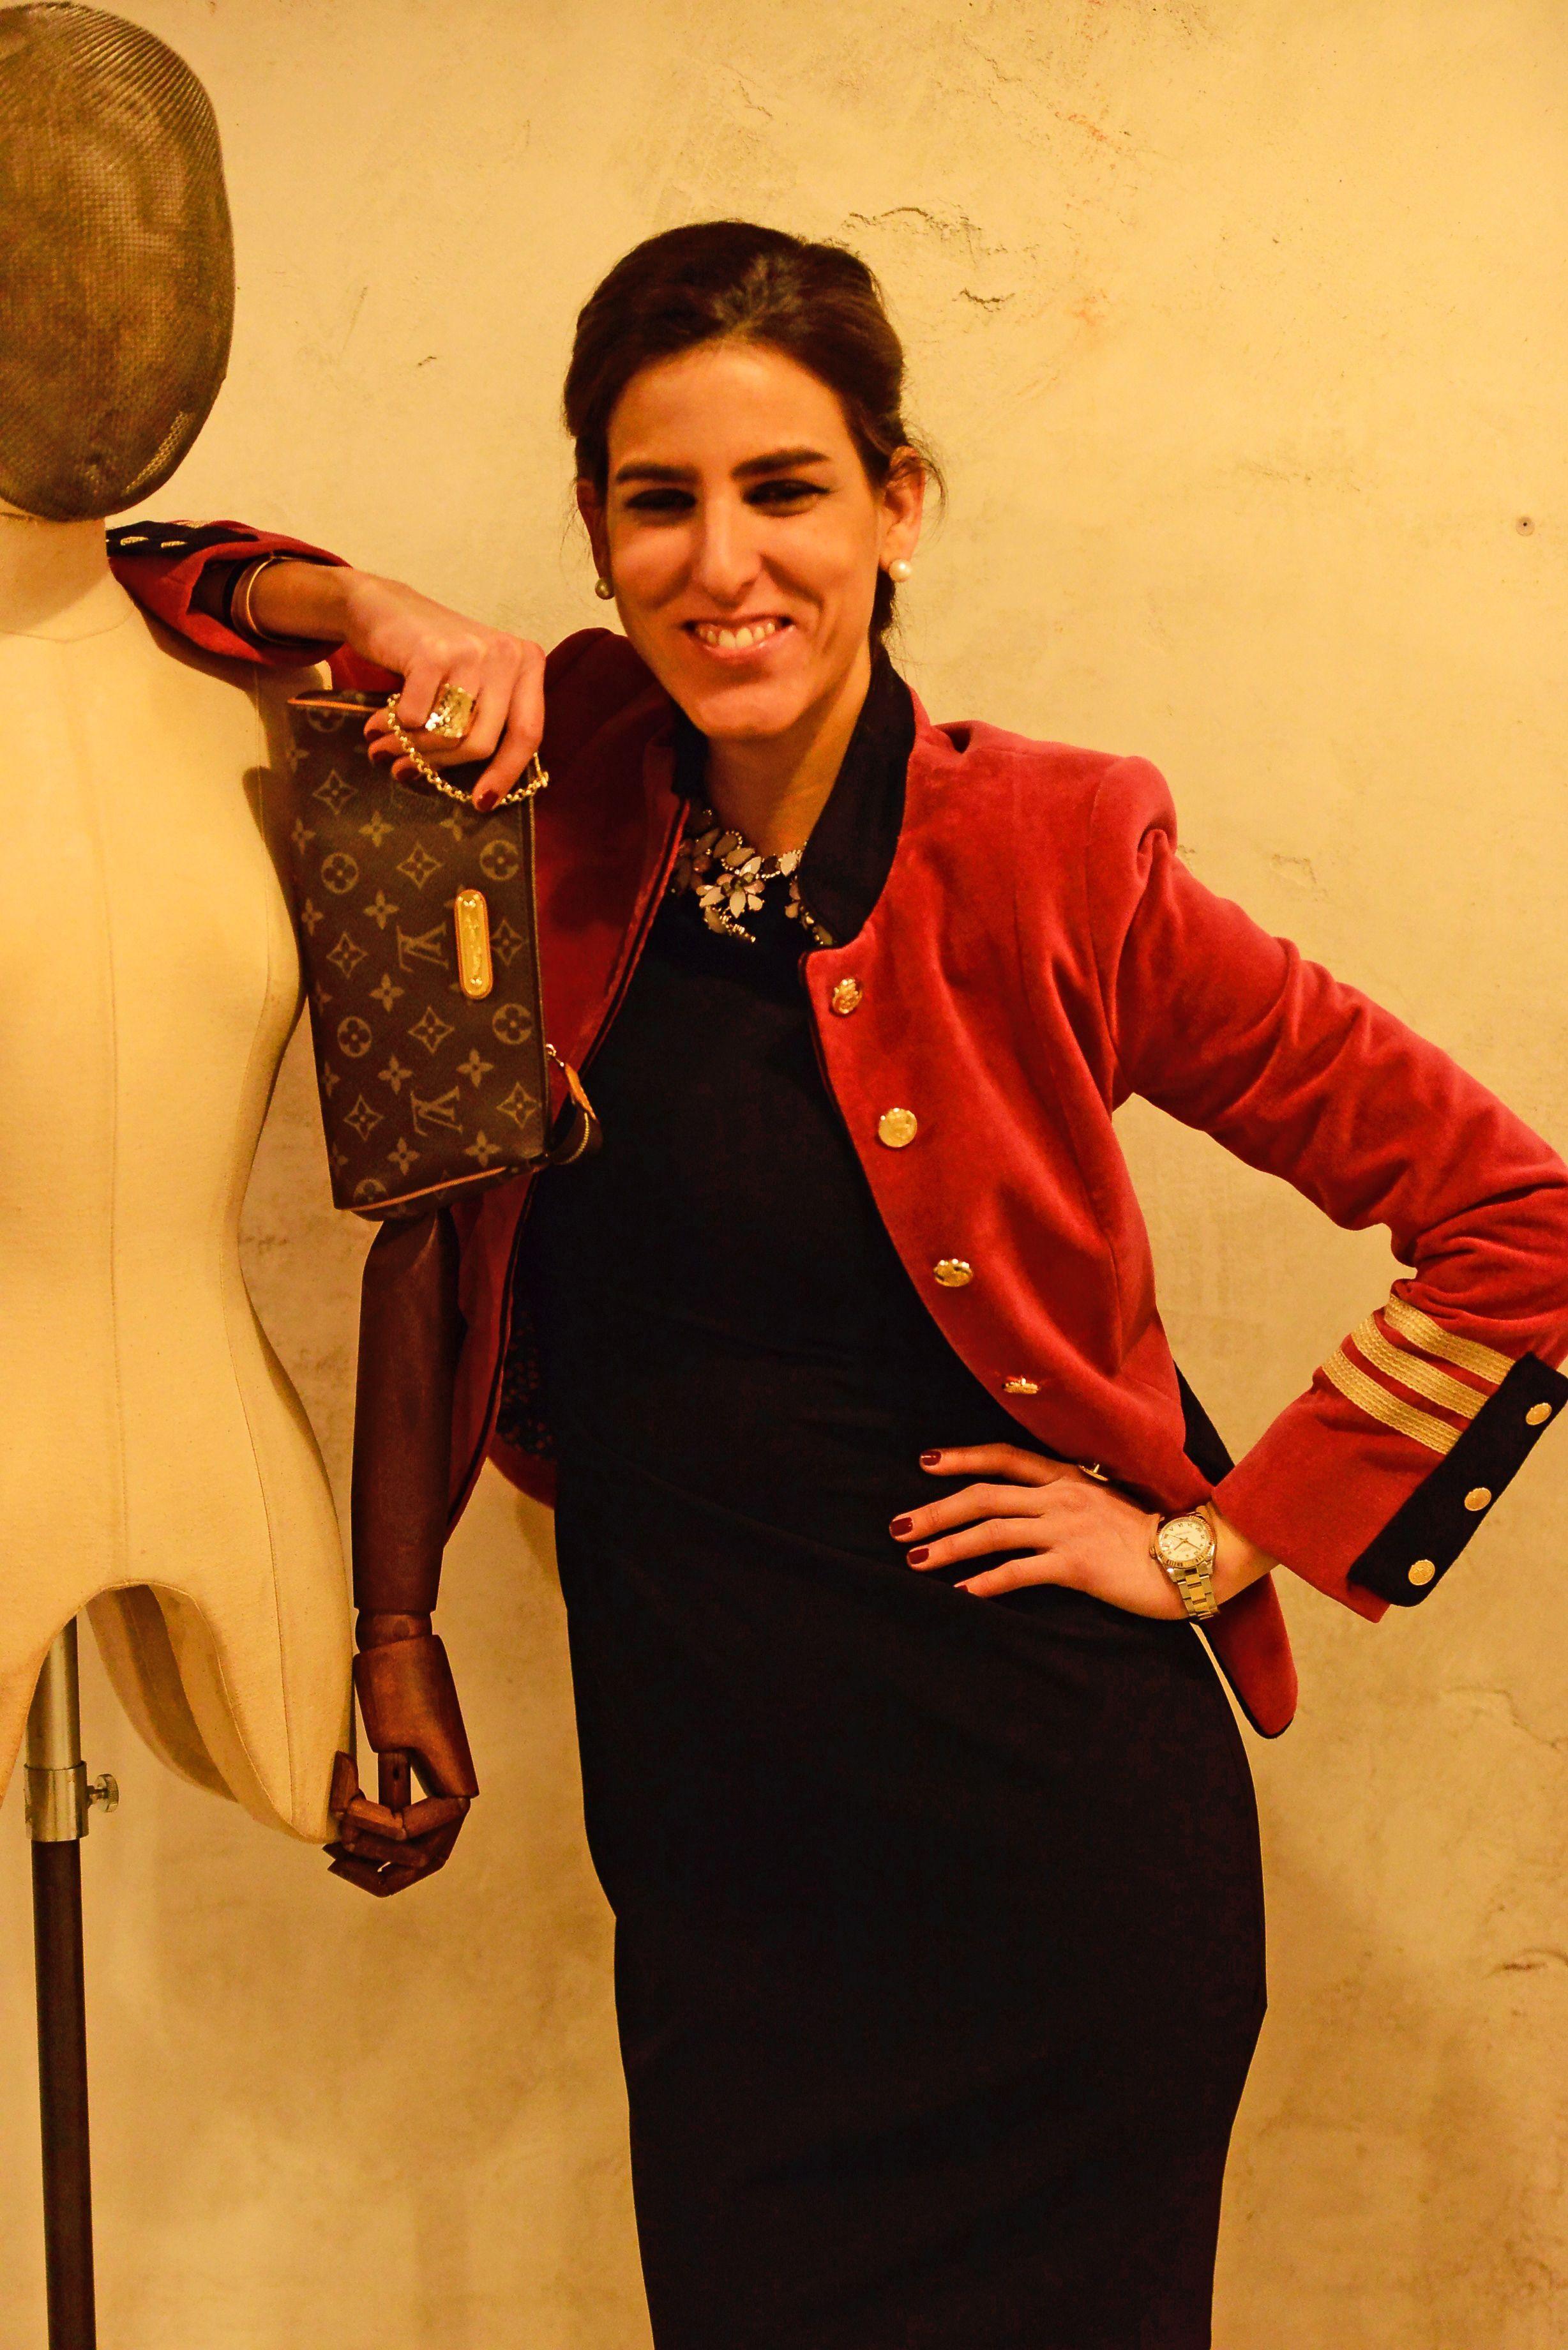 #LV bags #pochette eva #eva handbag